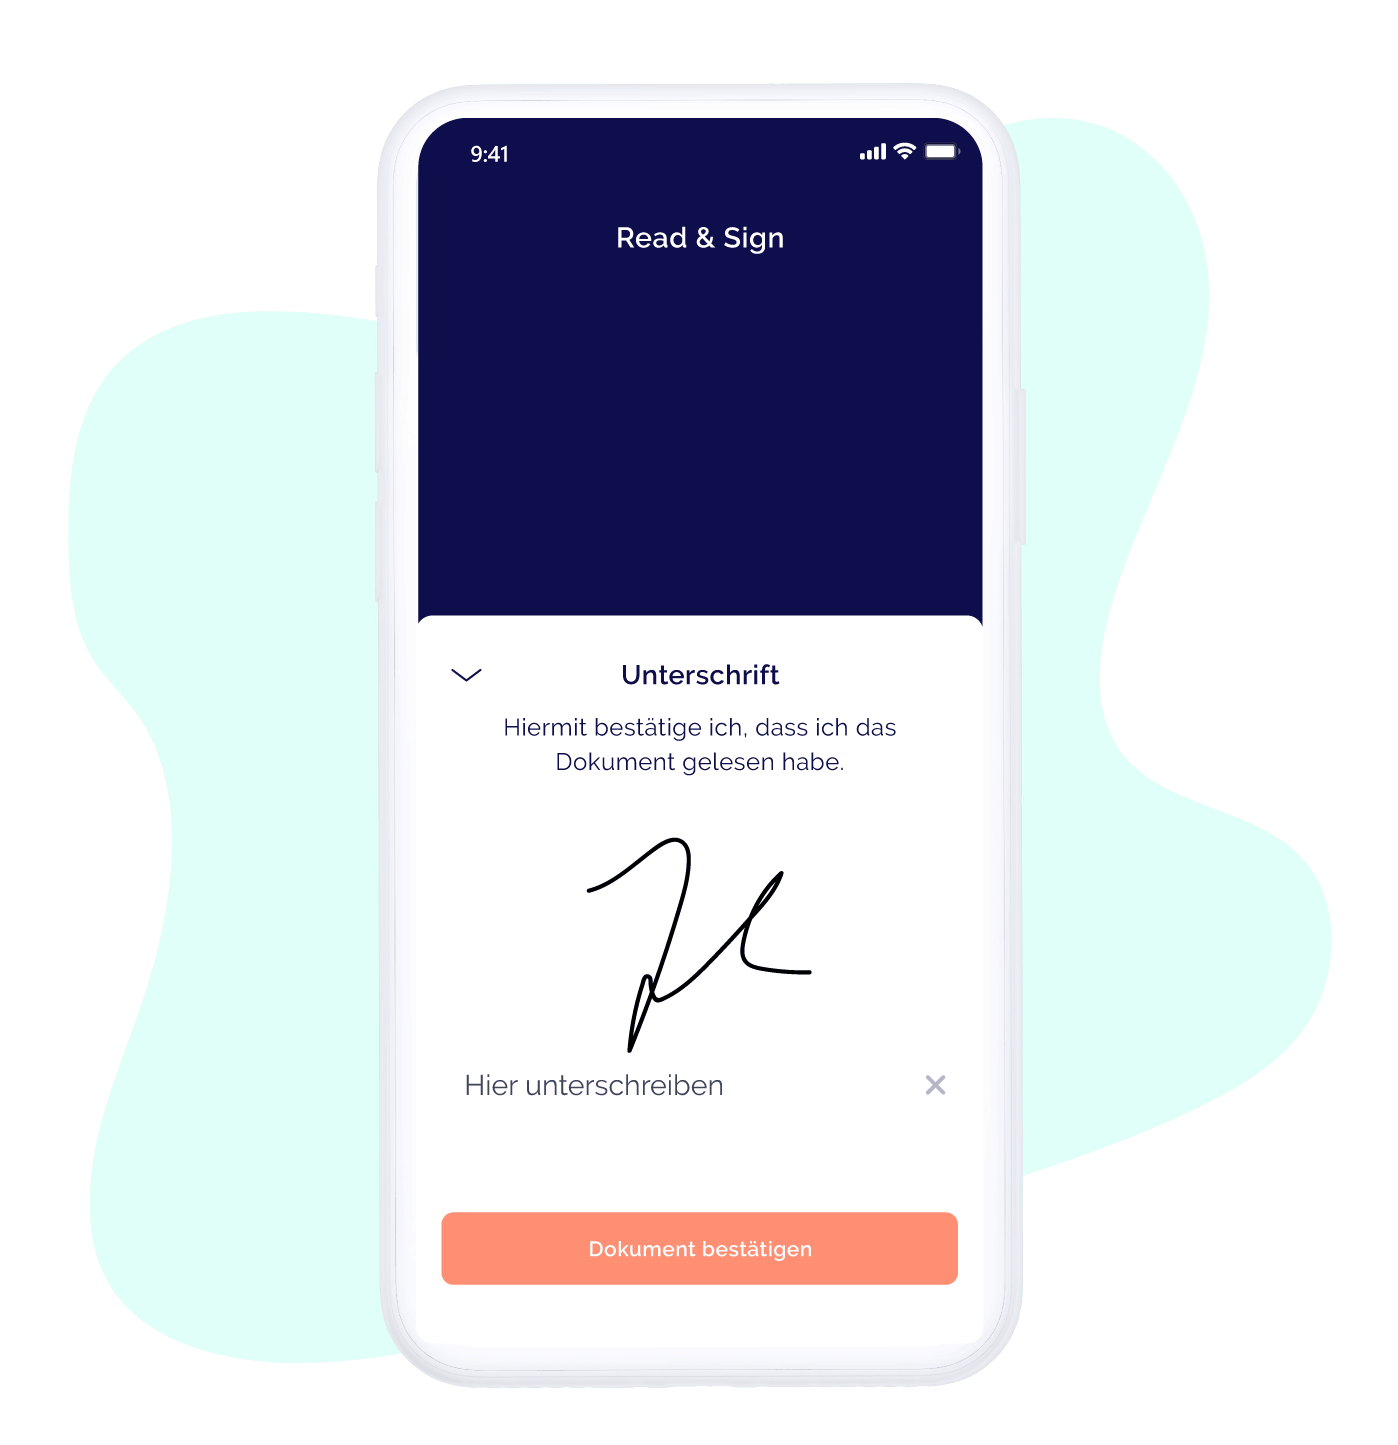 Read and Sign Unterschriftfeld in der App